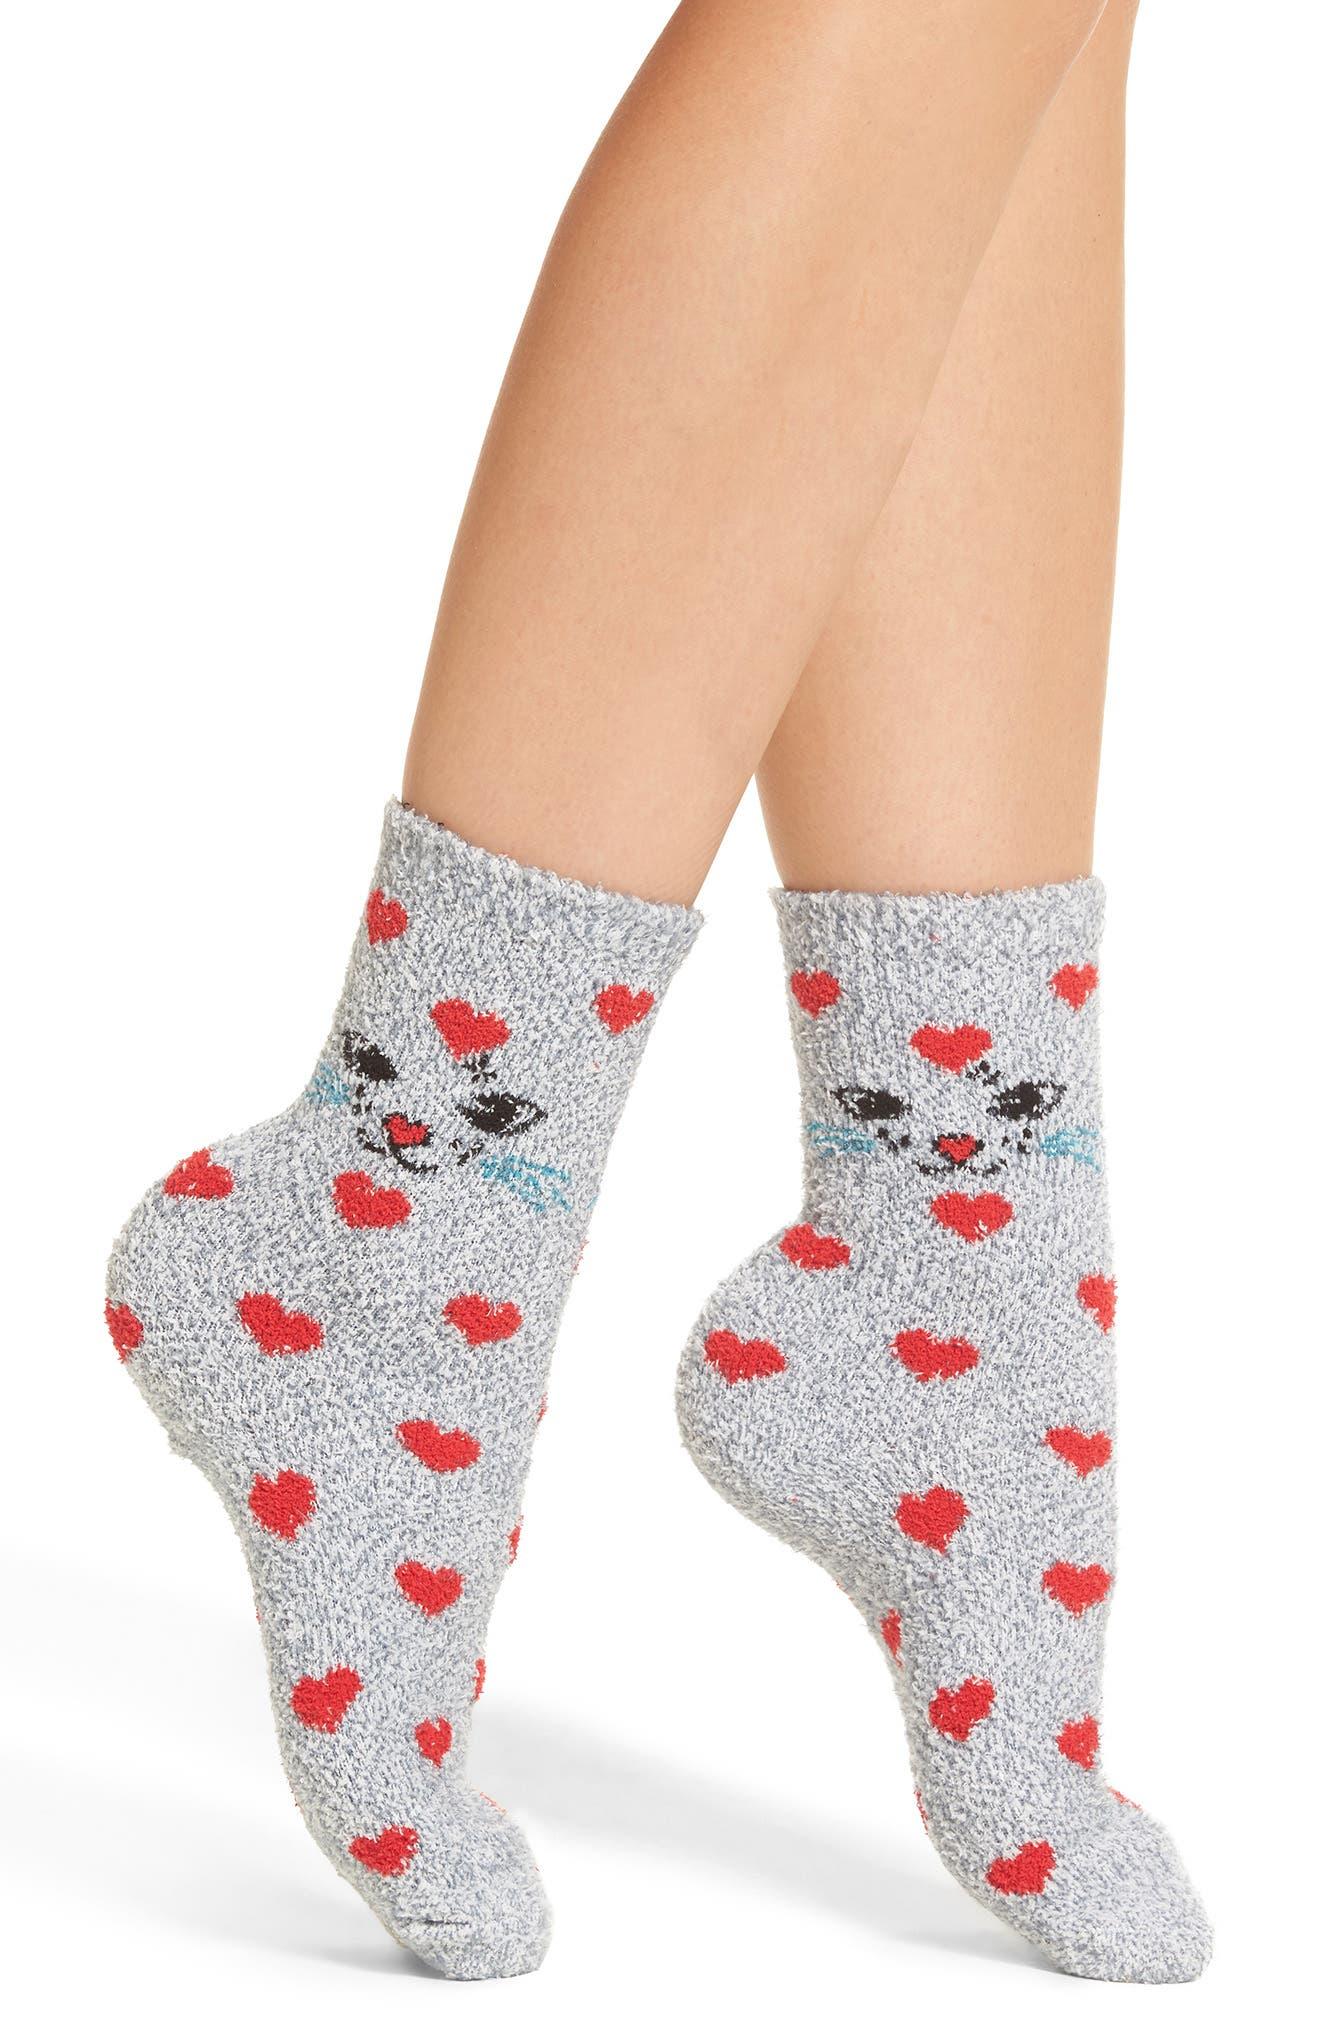 Chamois Crew Socks,                         Main,                         color, Grey Flannel Marl Kitty